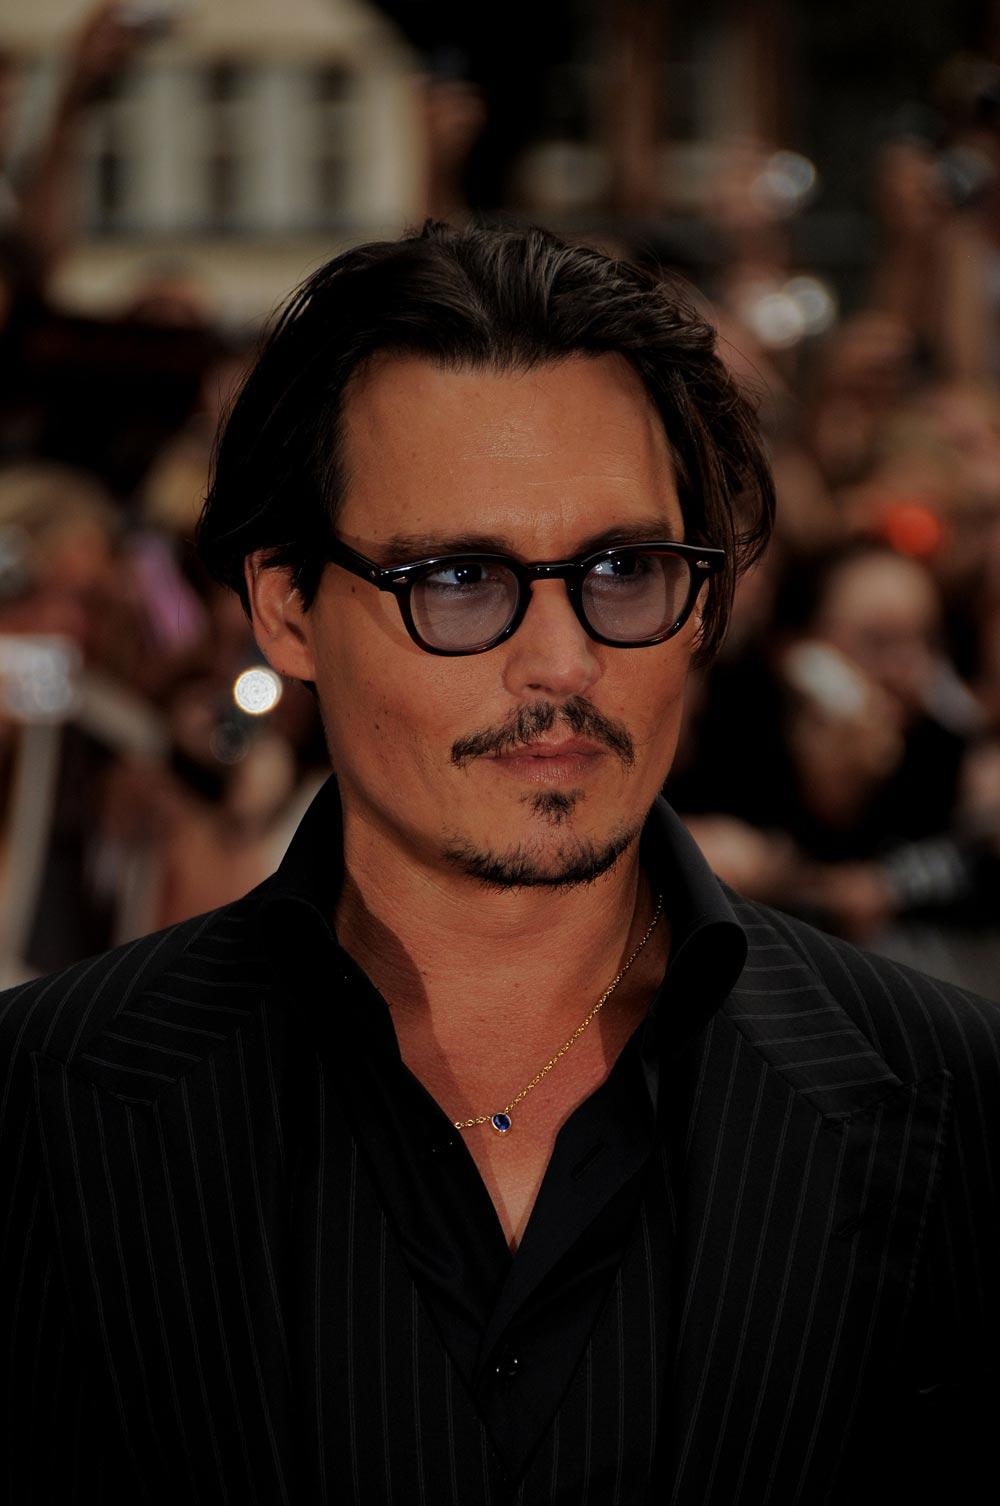 Johnny Depp Smoking Quotes Johnny depp Johnny Manziel Rich